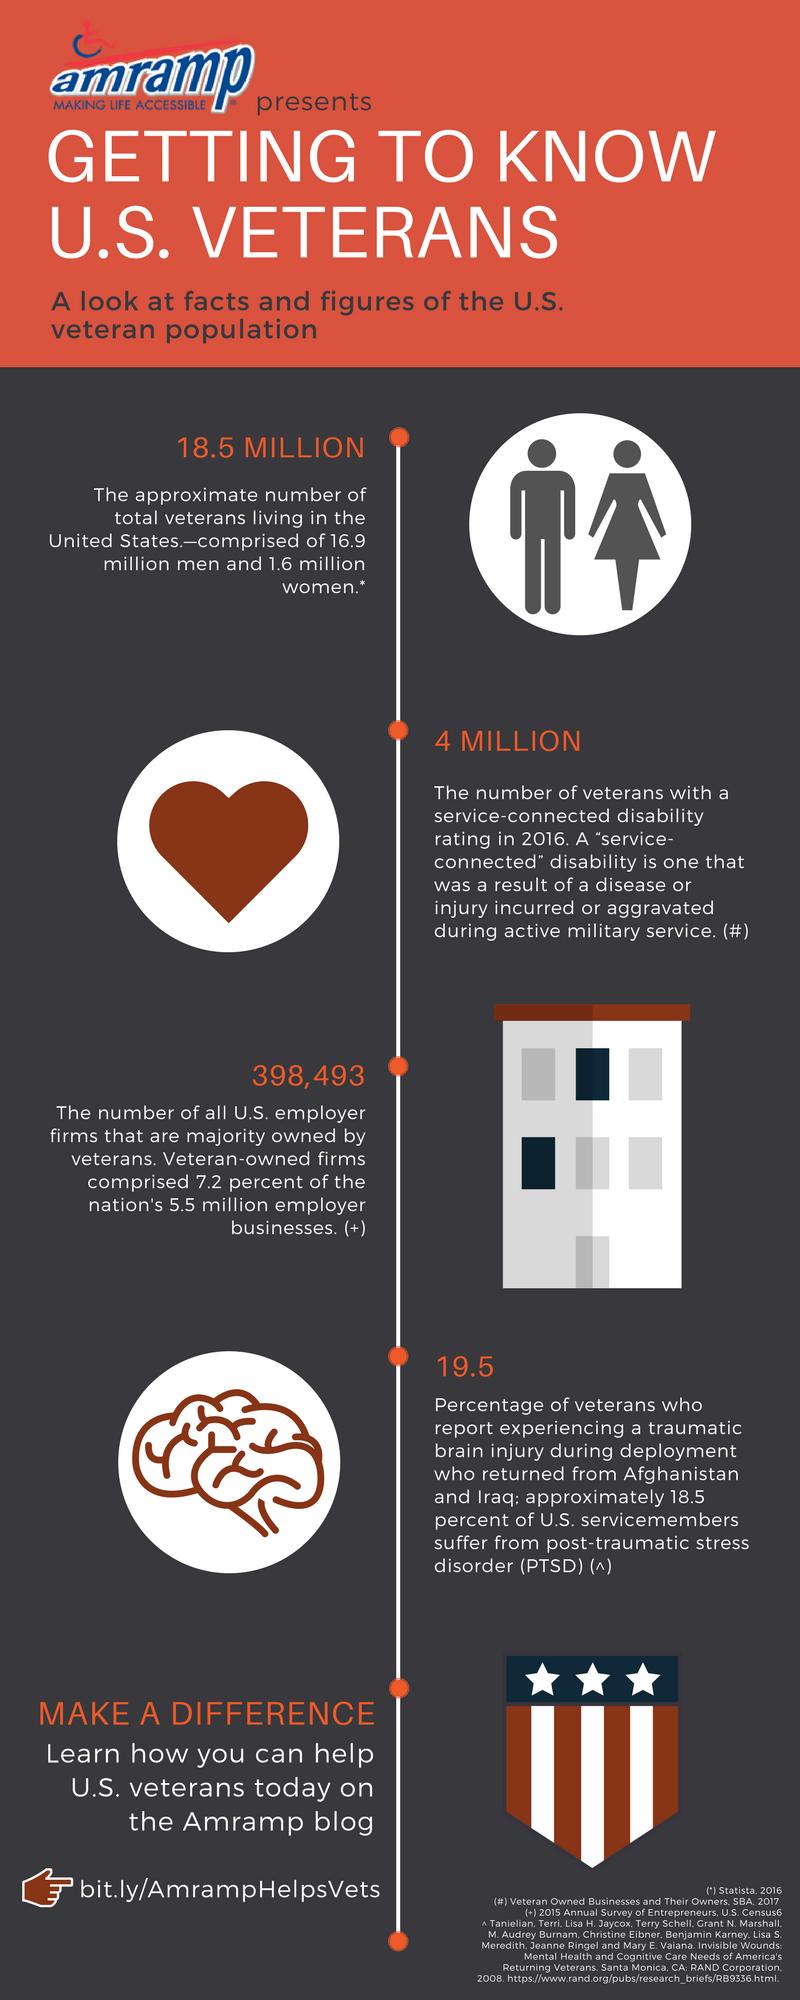 Amramp Veterans Day infographic